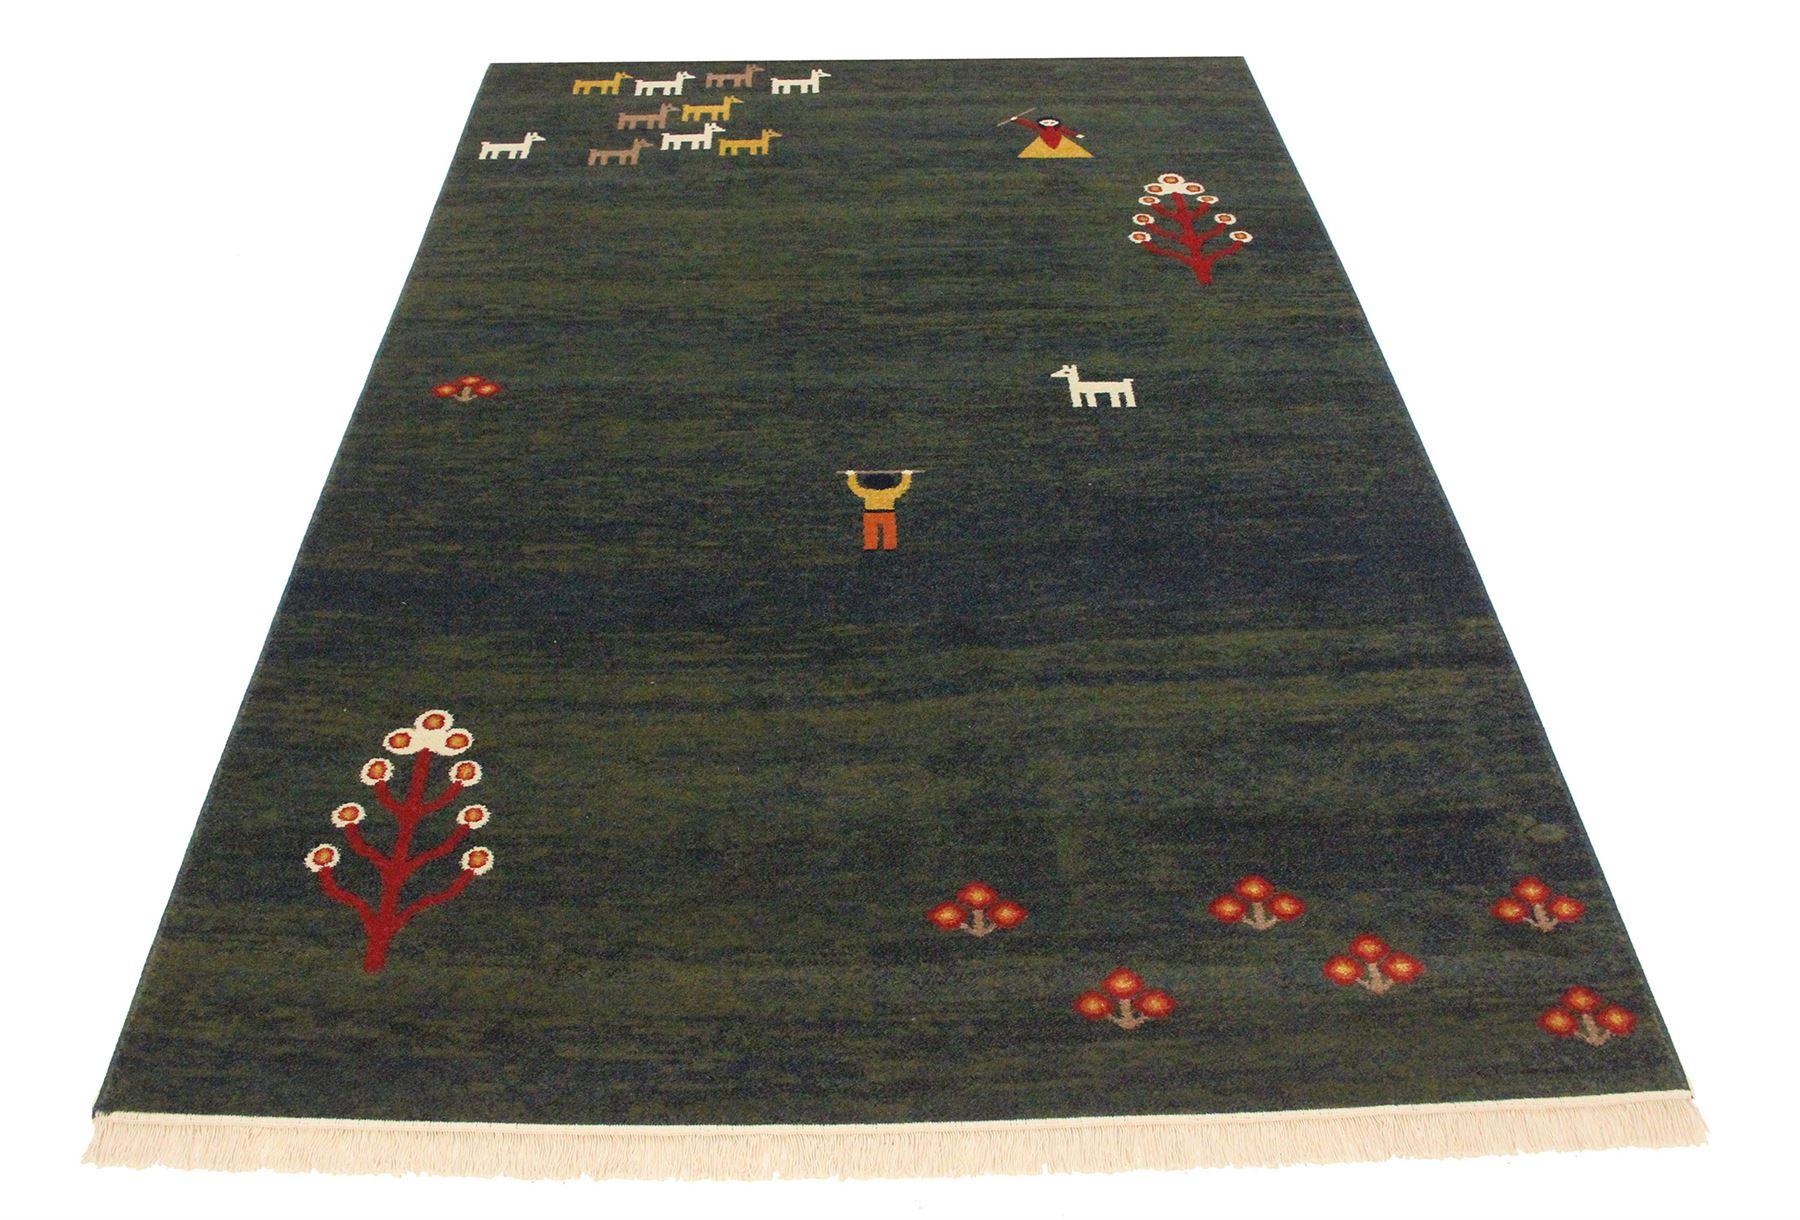 traditionell persisch design gabbeh rug verschiedene gr en eghlid teppich ebay. Black Bedroom Furniture Sets. Home Design Ideas